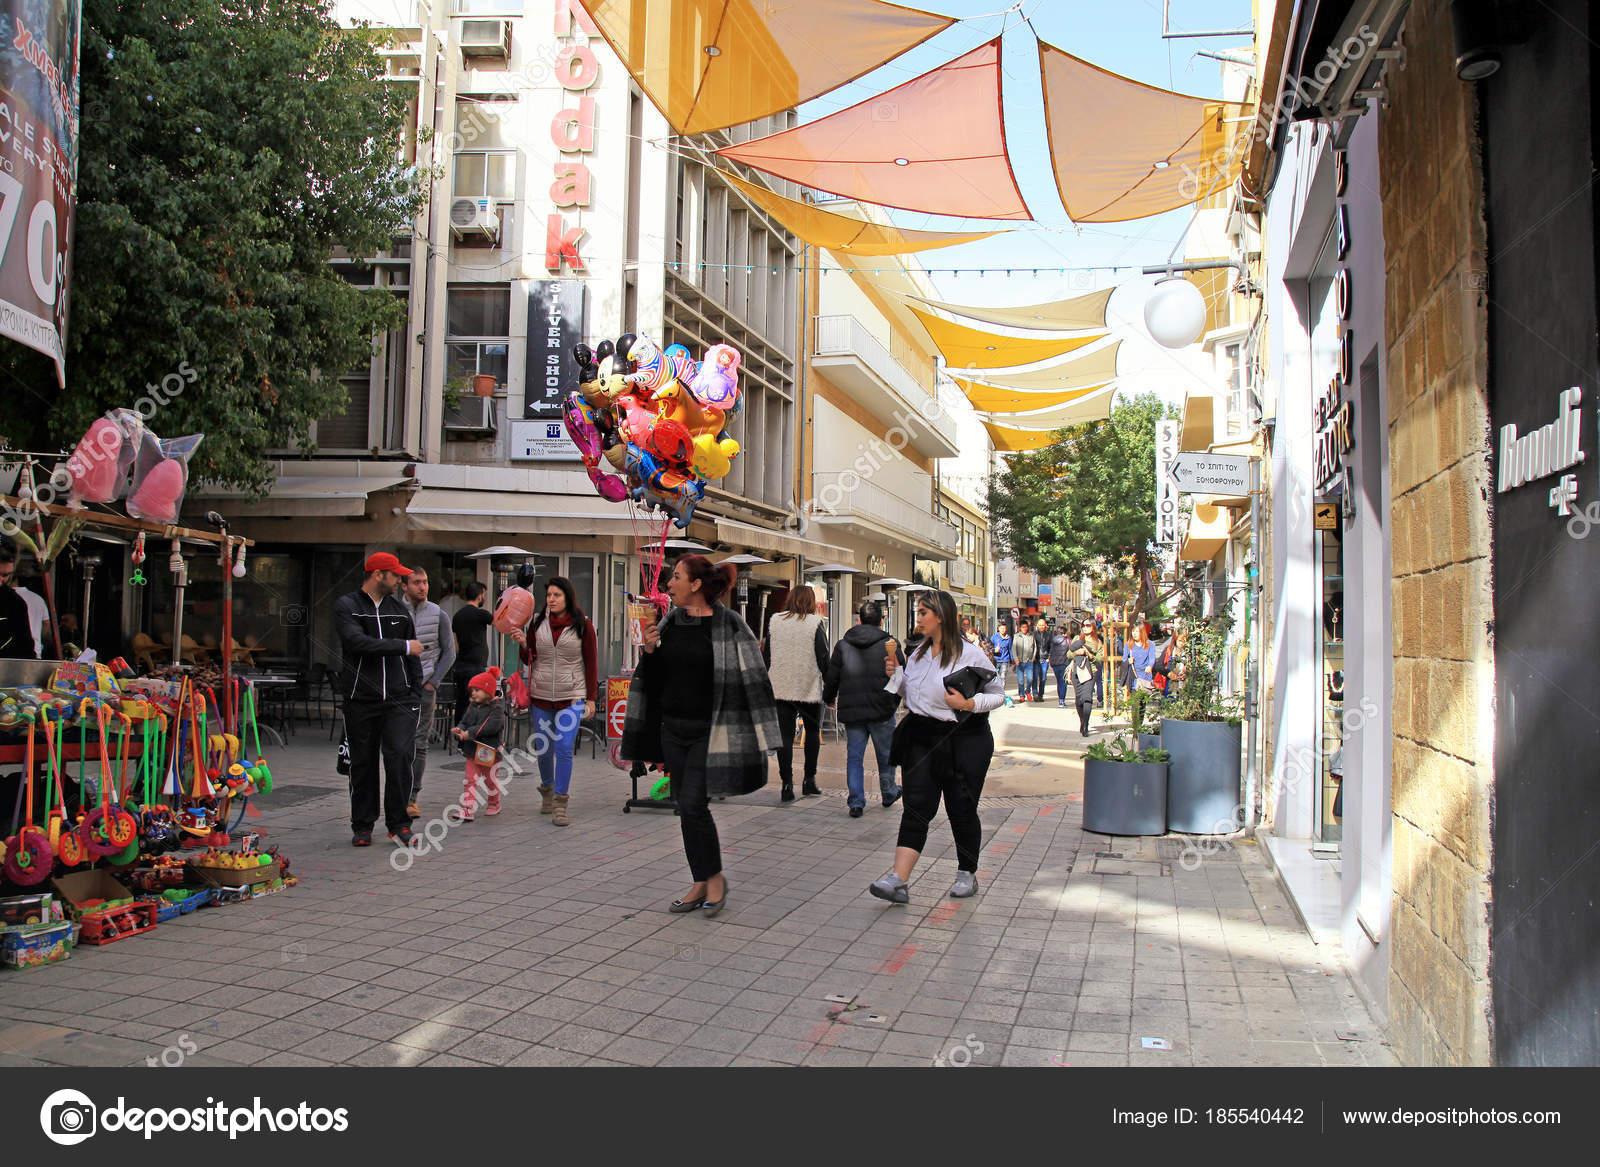 da125607fe9d τουρίστες το περπάτημα στη γειτονιά λαϊκή γειτονιά Λευκωσία